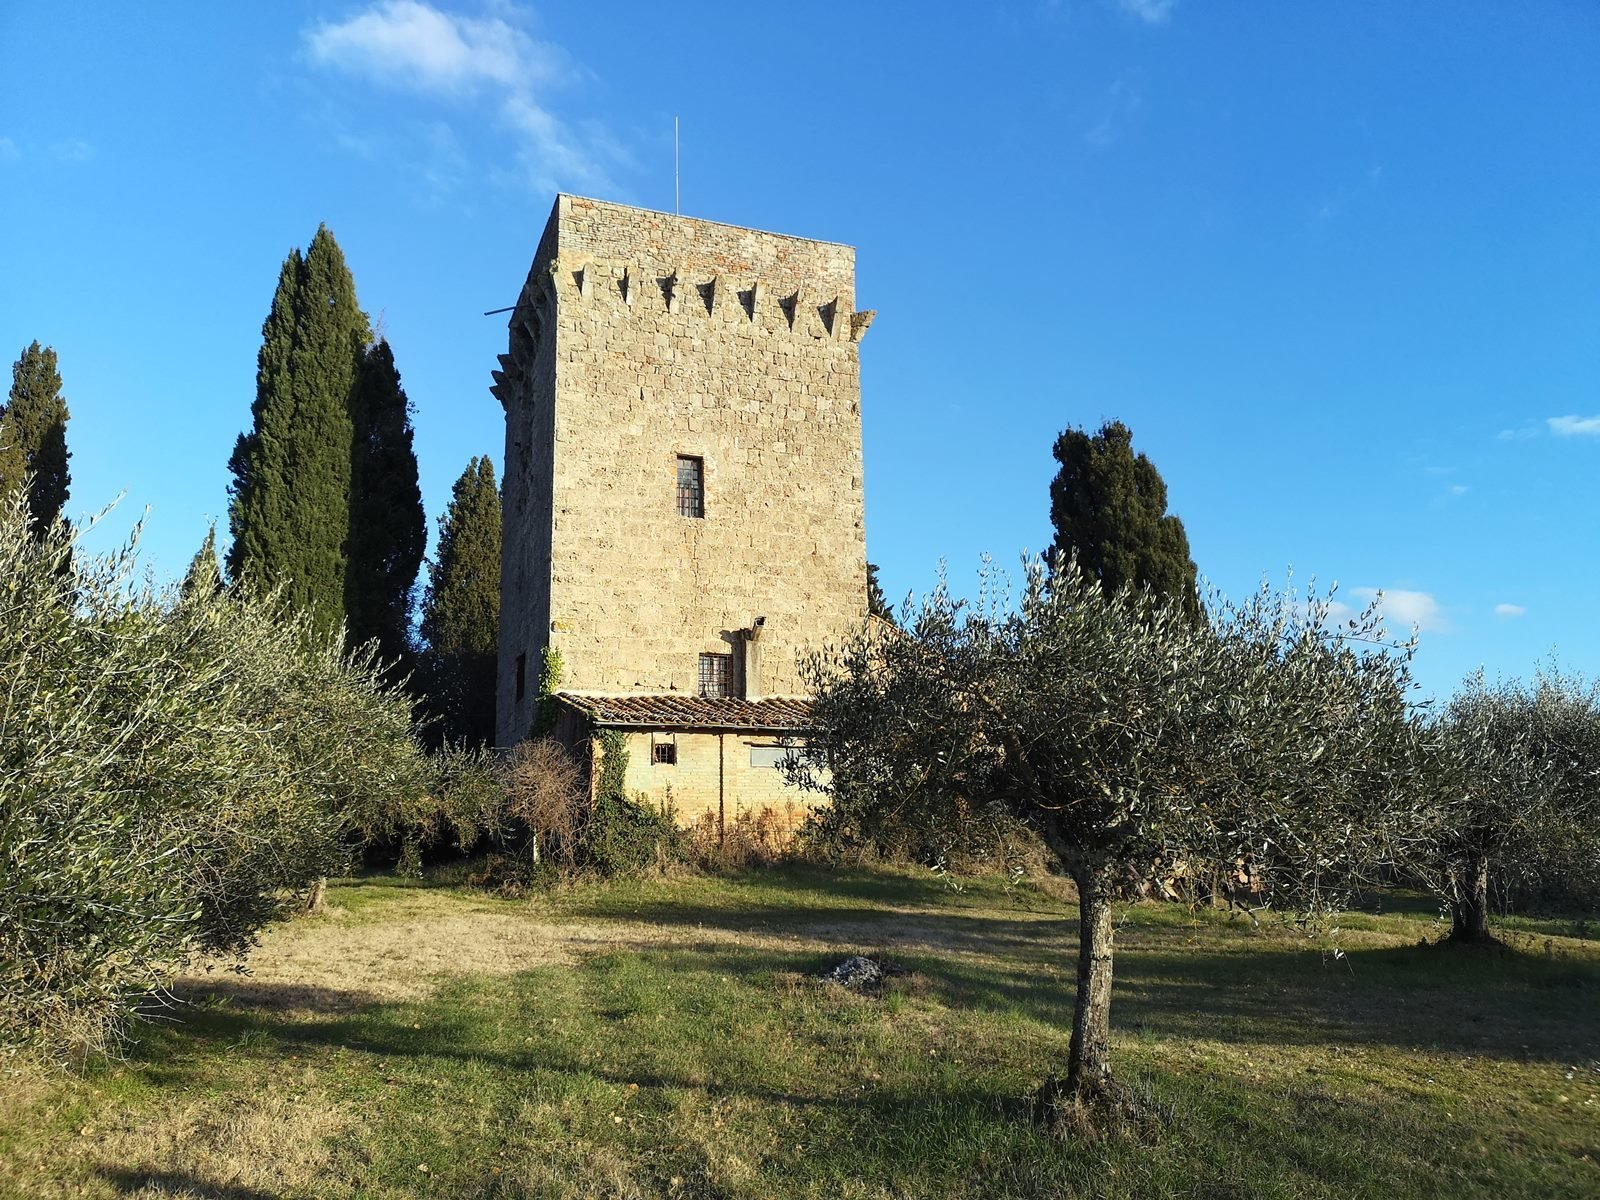 Castle in Chiusi, Tuscany, Italy 1 - 10469448